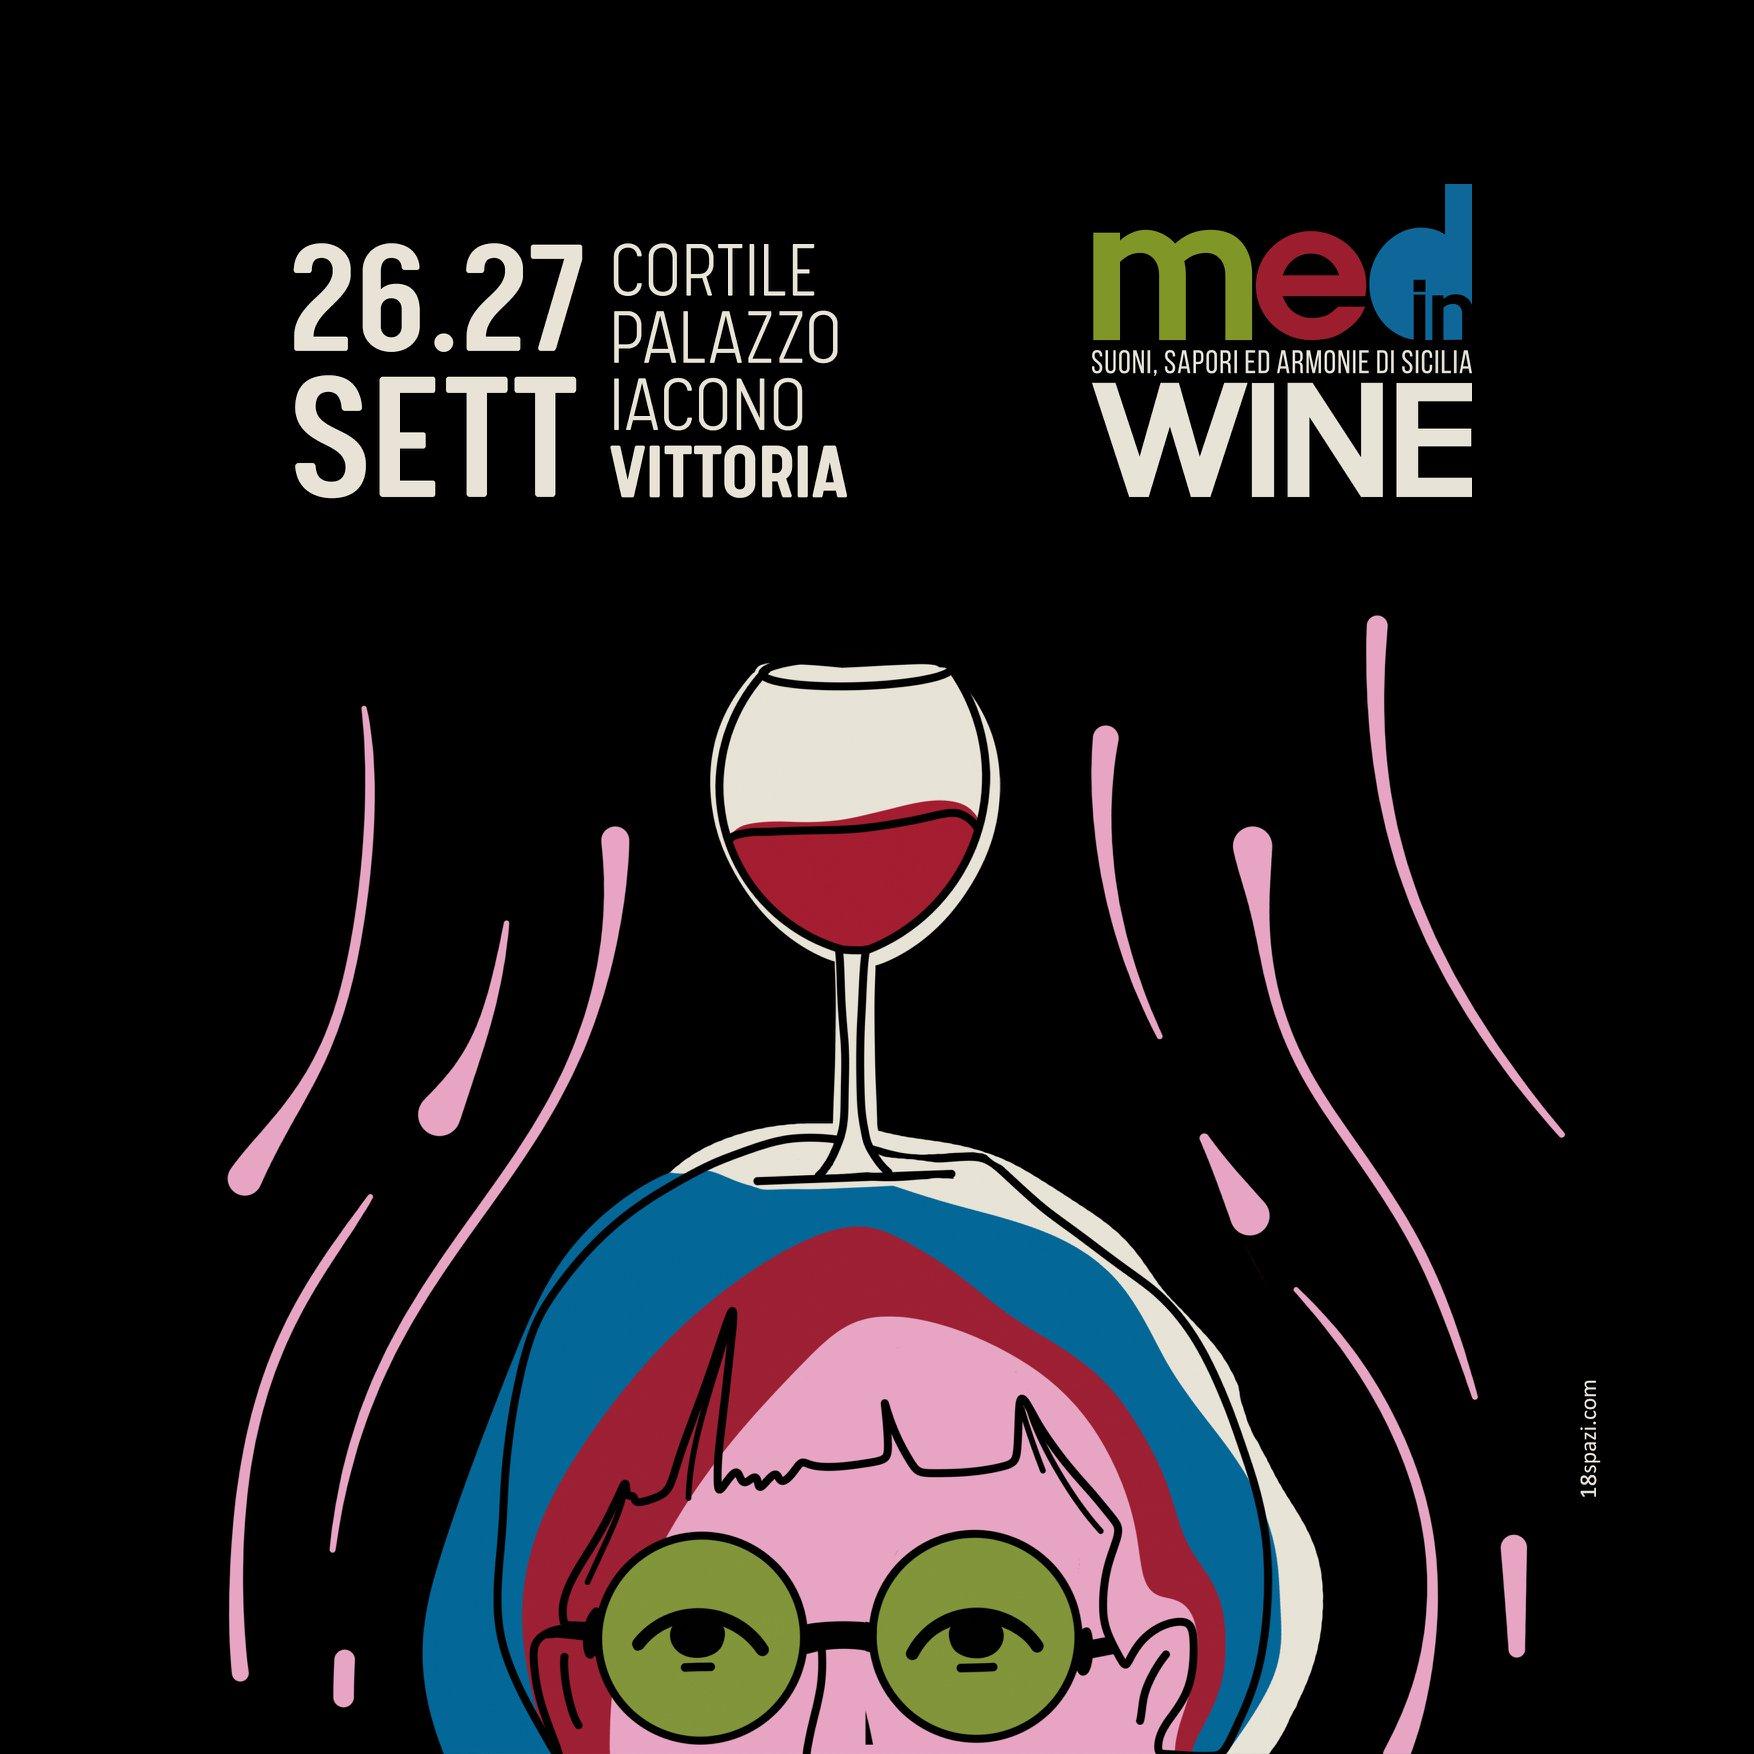 A MedinWine 2020 la Sicilia del vino